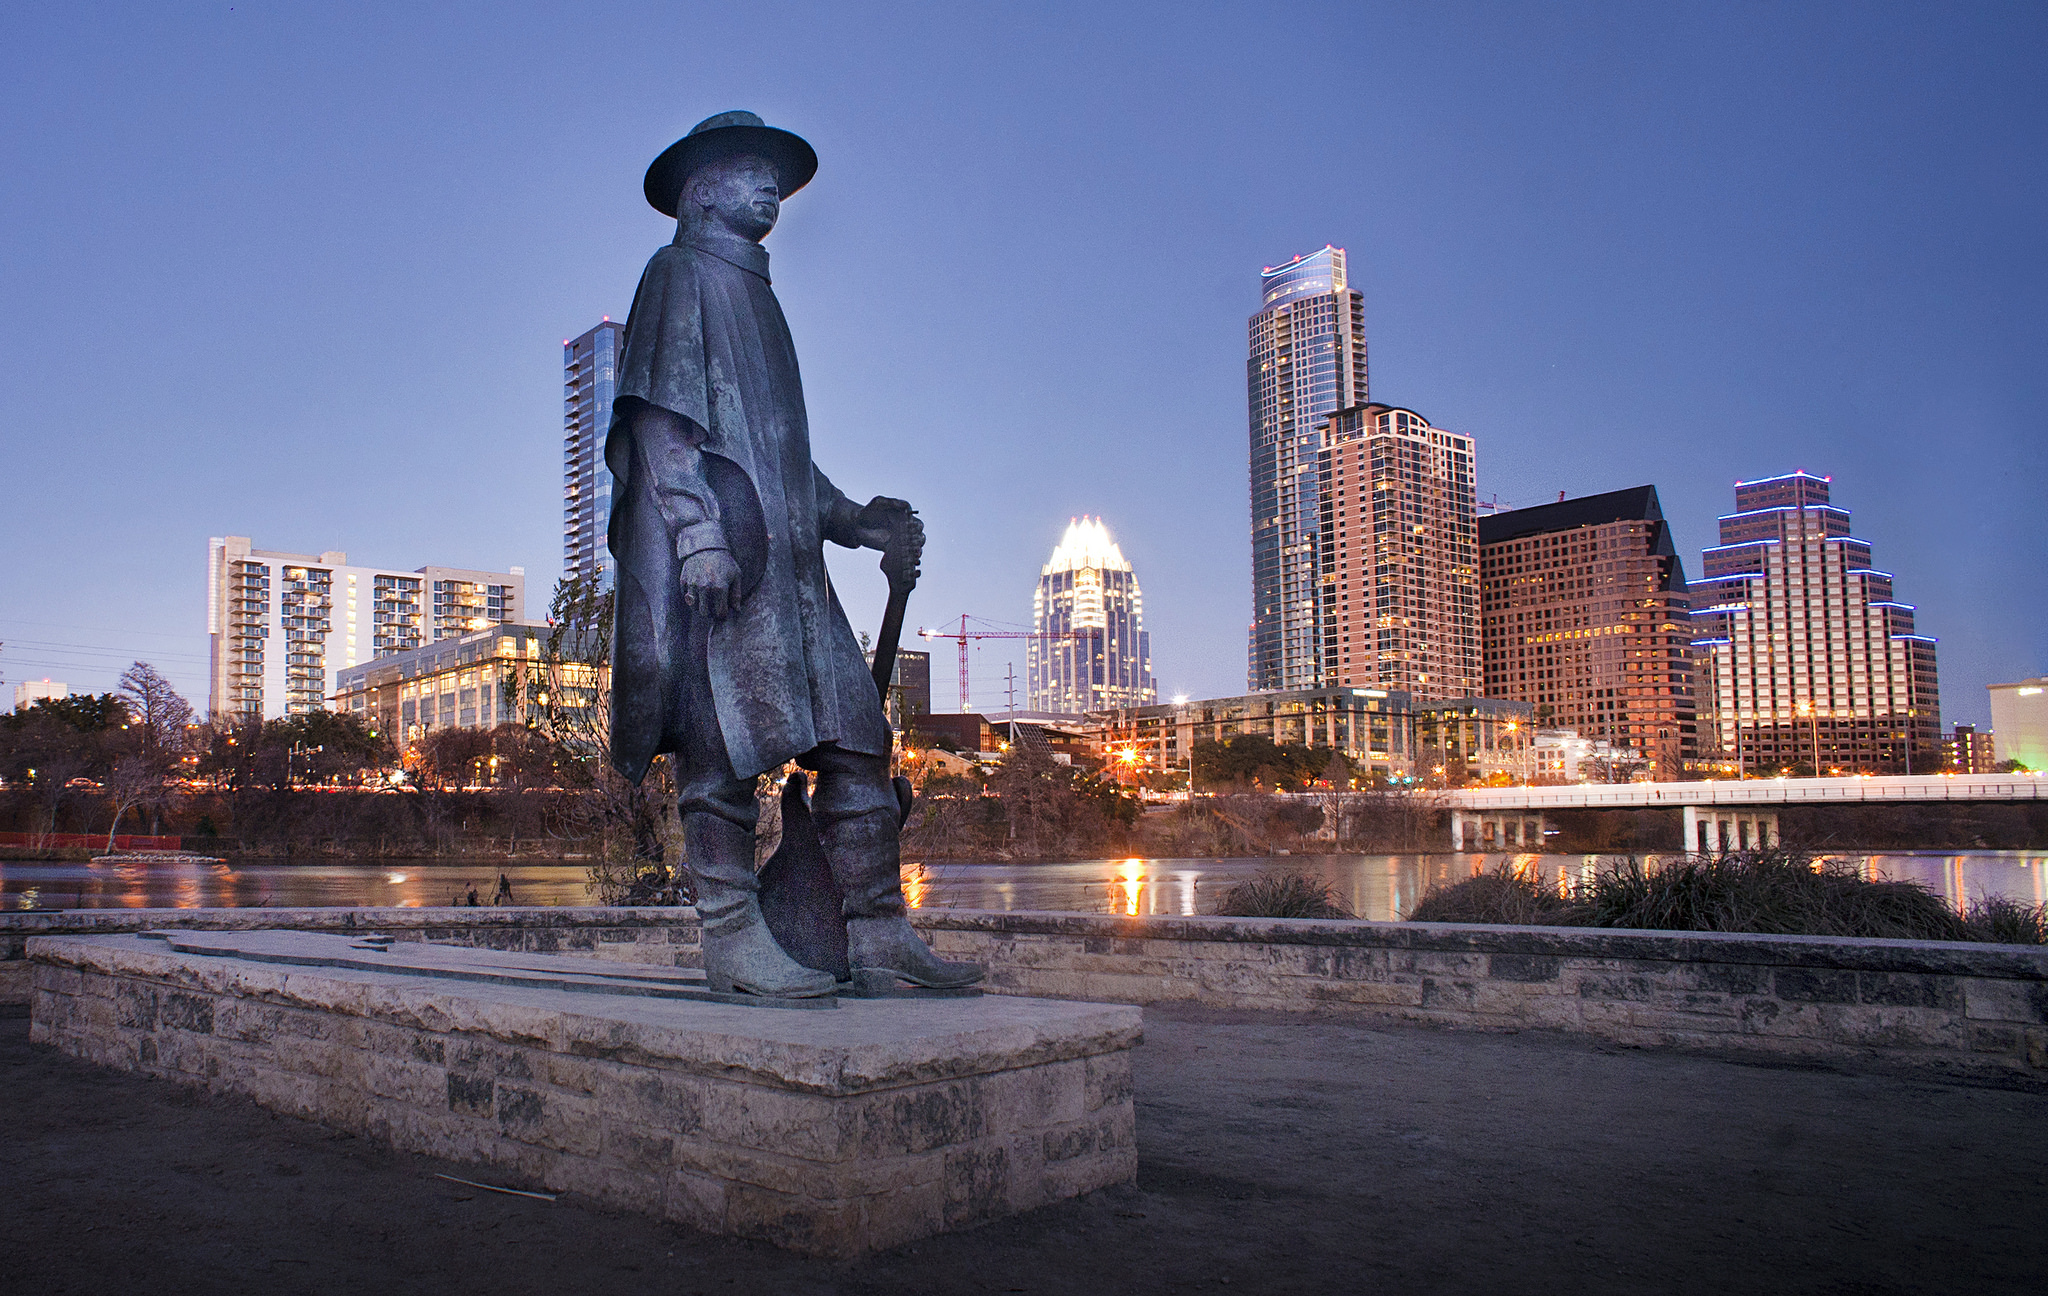 Stevie Ray Vaughn Statue © Katie Haugland/Flickr